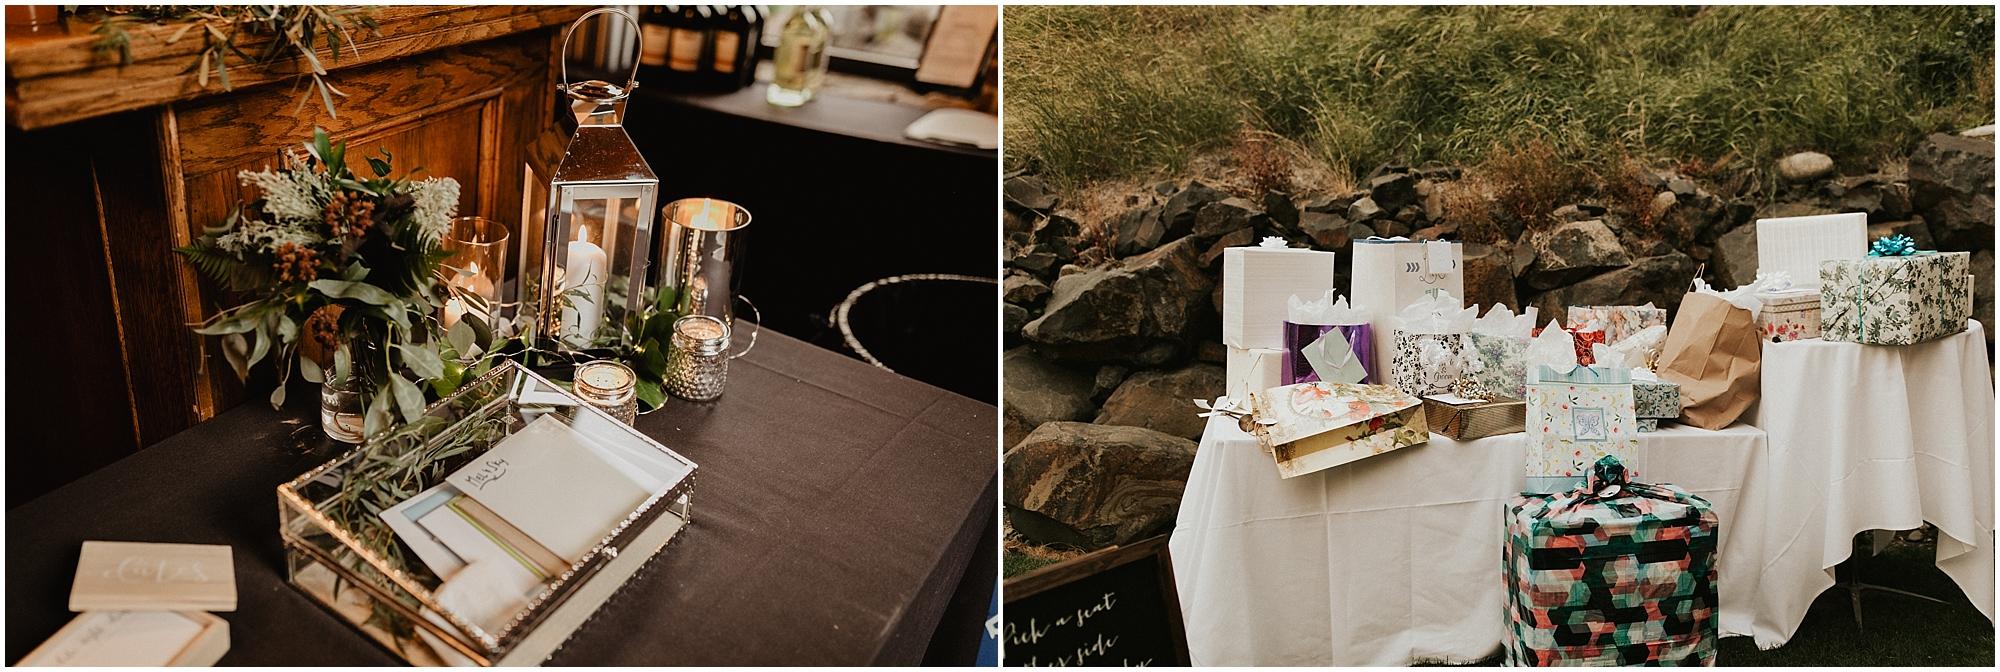 Chateau Rive Spokane Wedding Cassie Trottier Photography1131.jpg